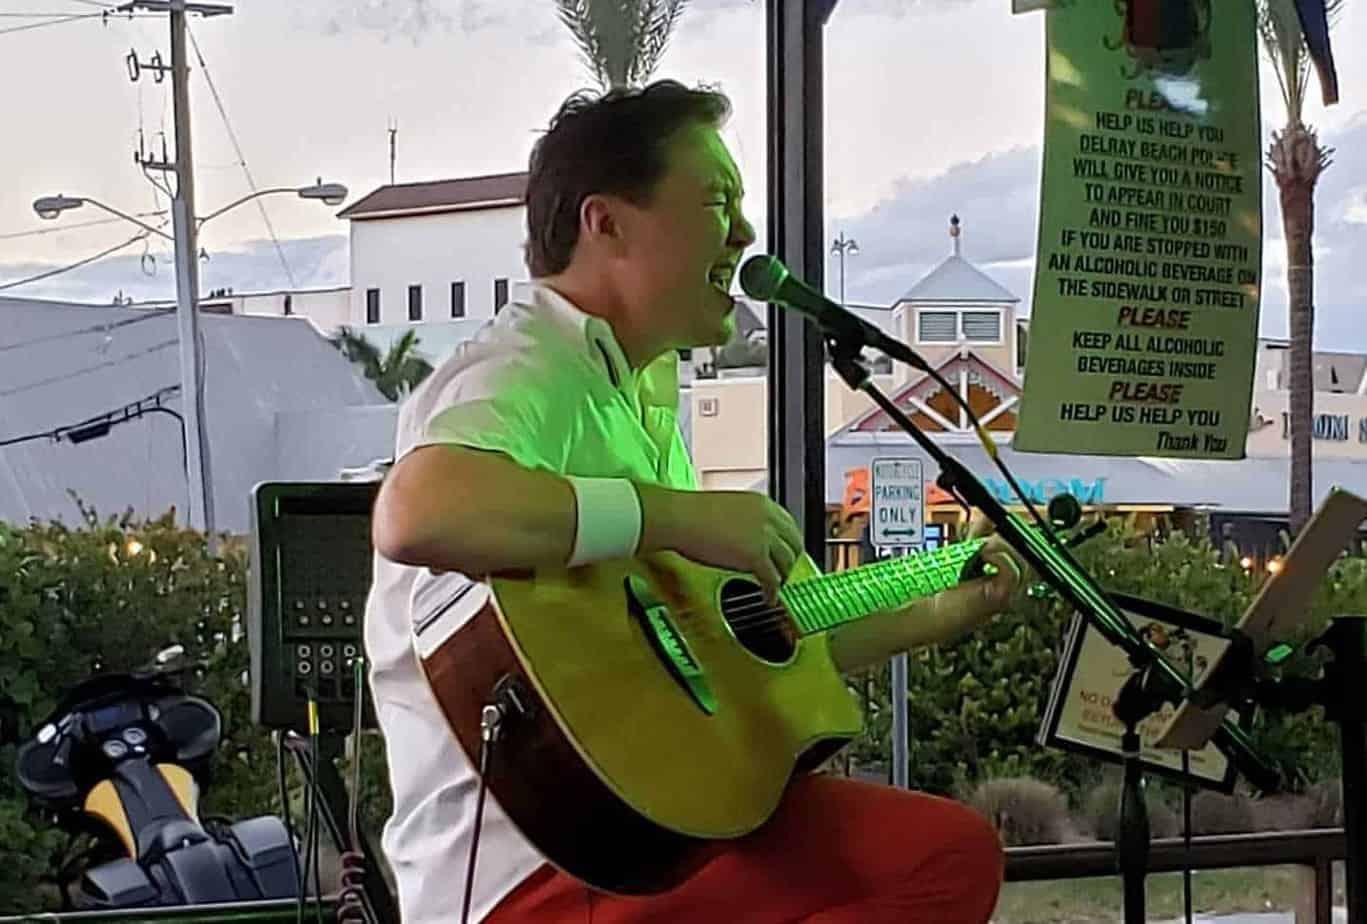 Shawn Schumann at The Twisted Tuna